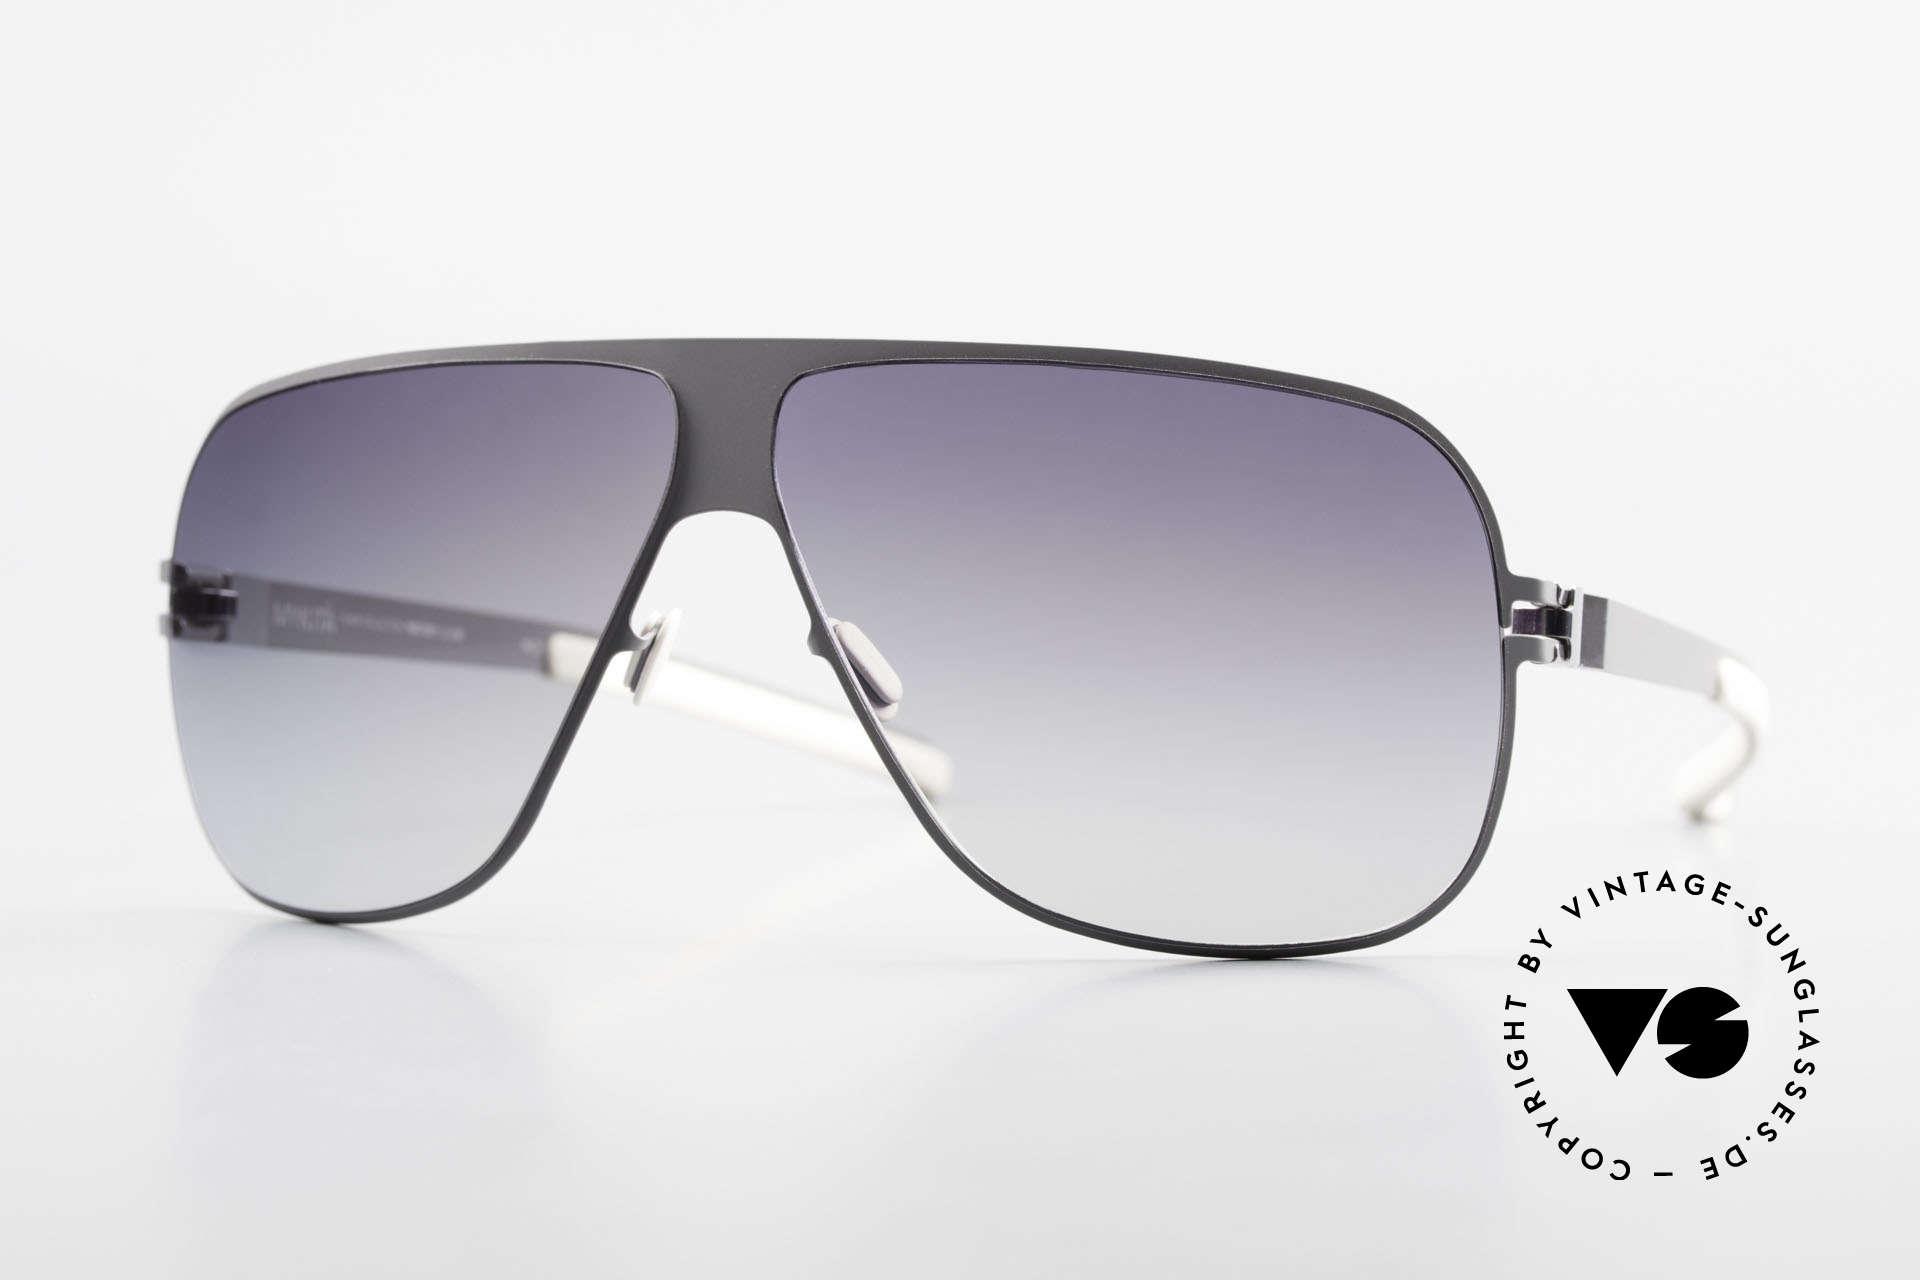 Mykita Hector 2009's Vintage Mykita Shades, original VINTAGE MYKITA men's sunglasses from 2009, Made for Men